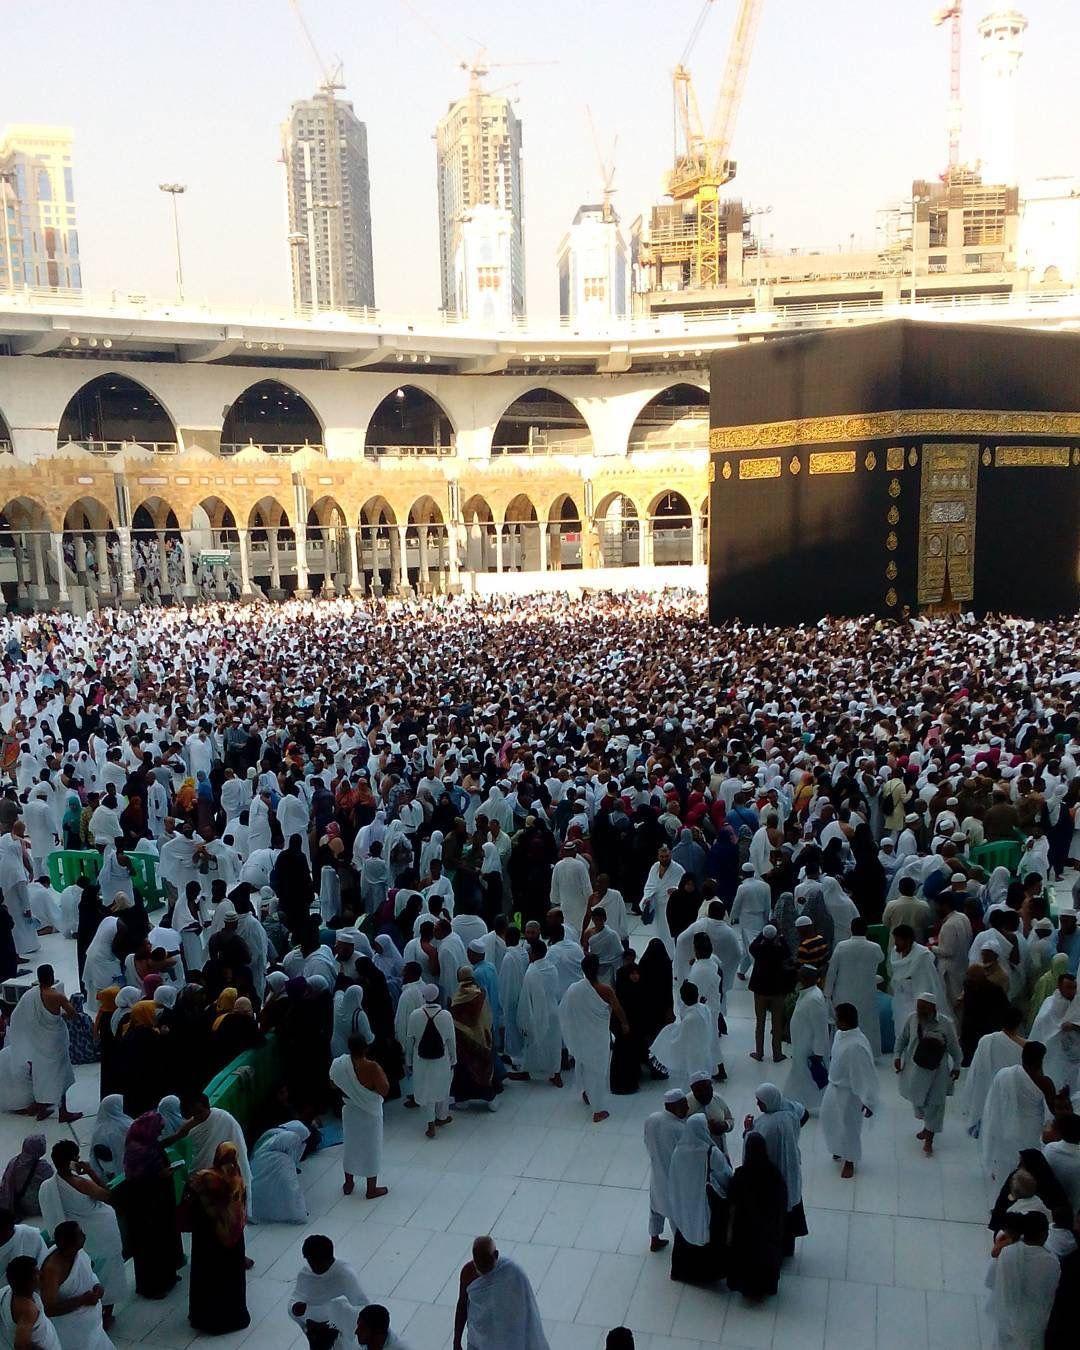 Pin By Syeda Fariha On Makkah Madinah Mecca Kaaba Mekkah Mecca